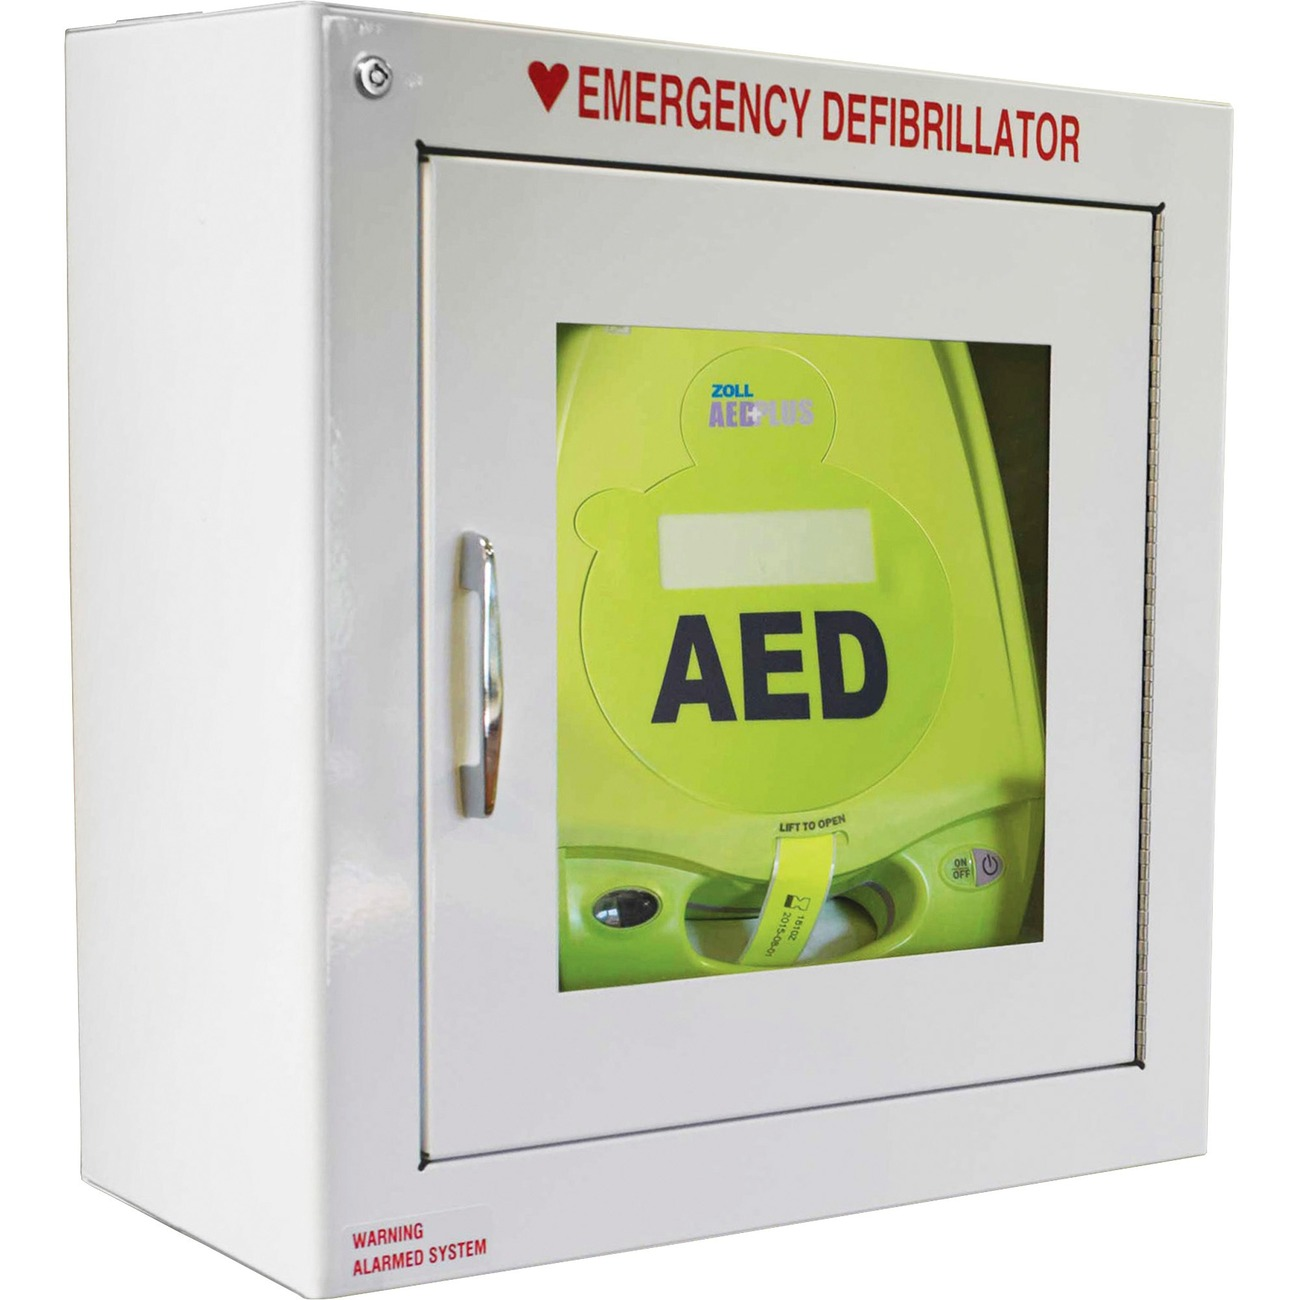 External Defibrillator Cabinets Cabinets Matttroy